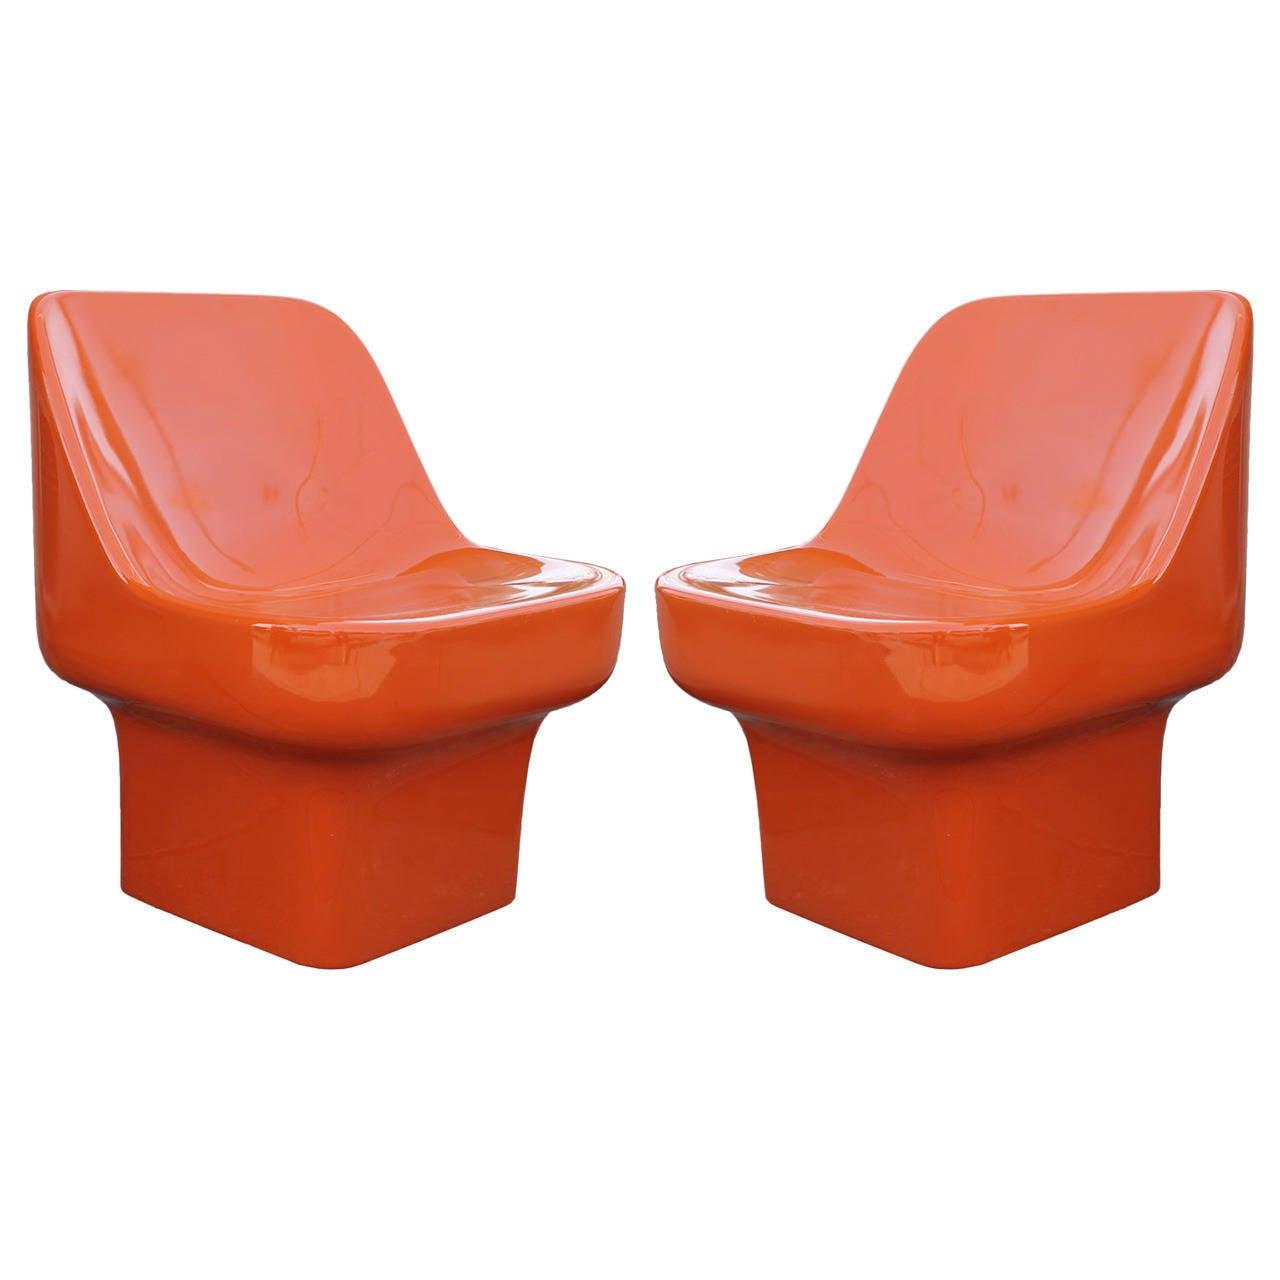 Douglas Deeds Glossy Orange Lacquered Fiberglass Chairs at